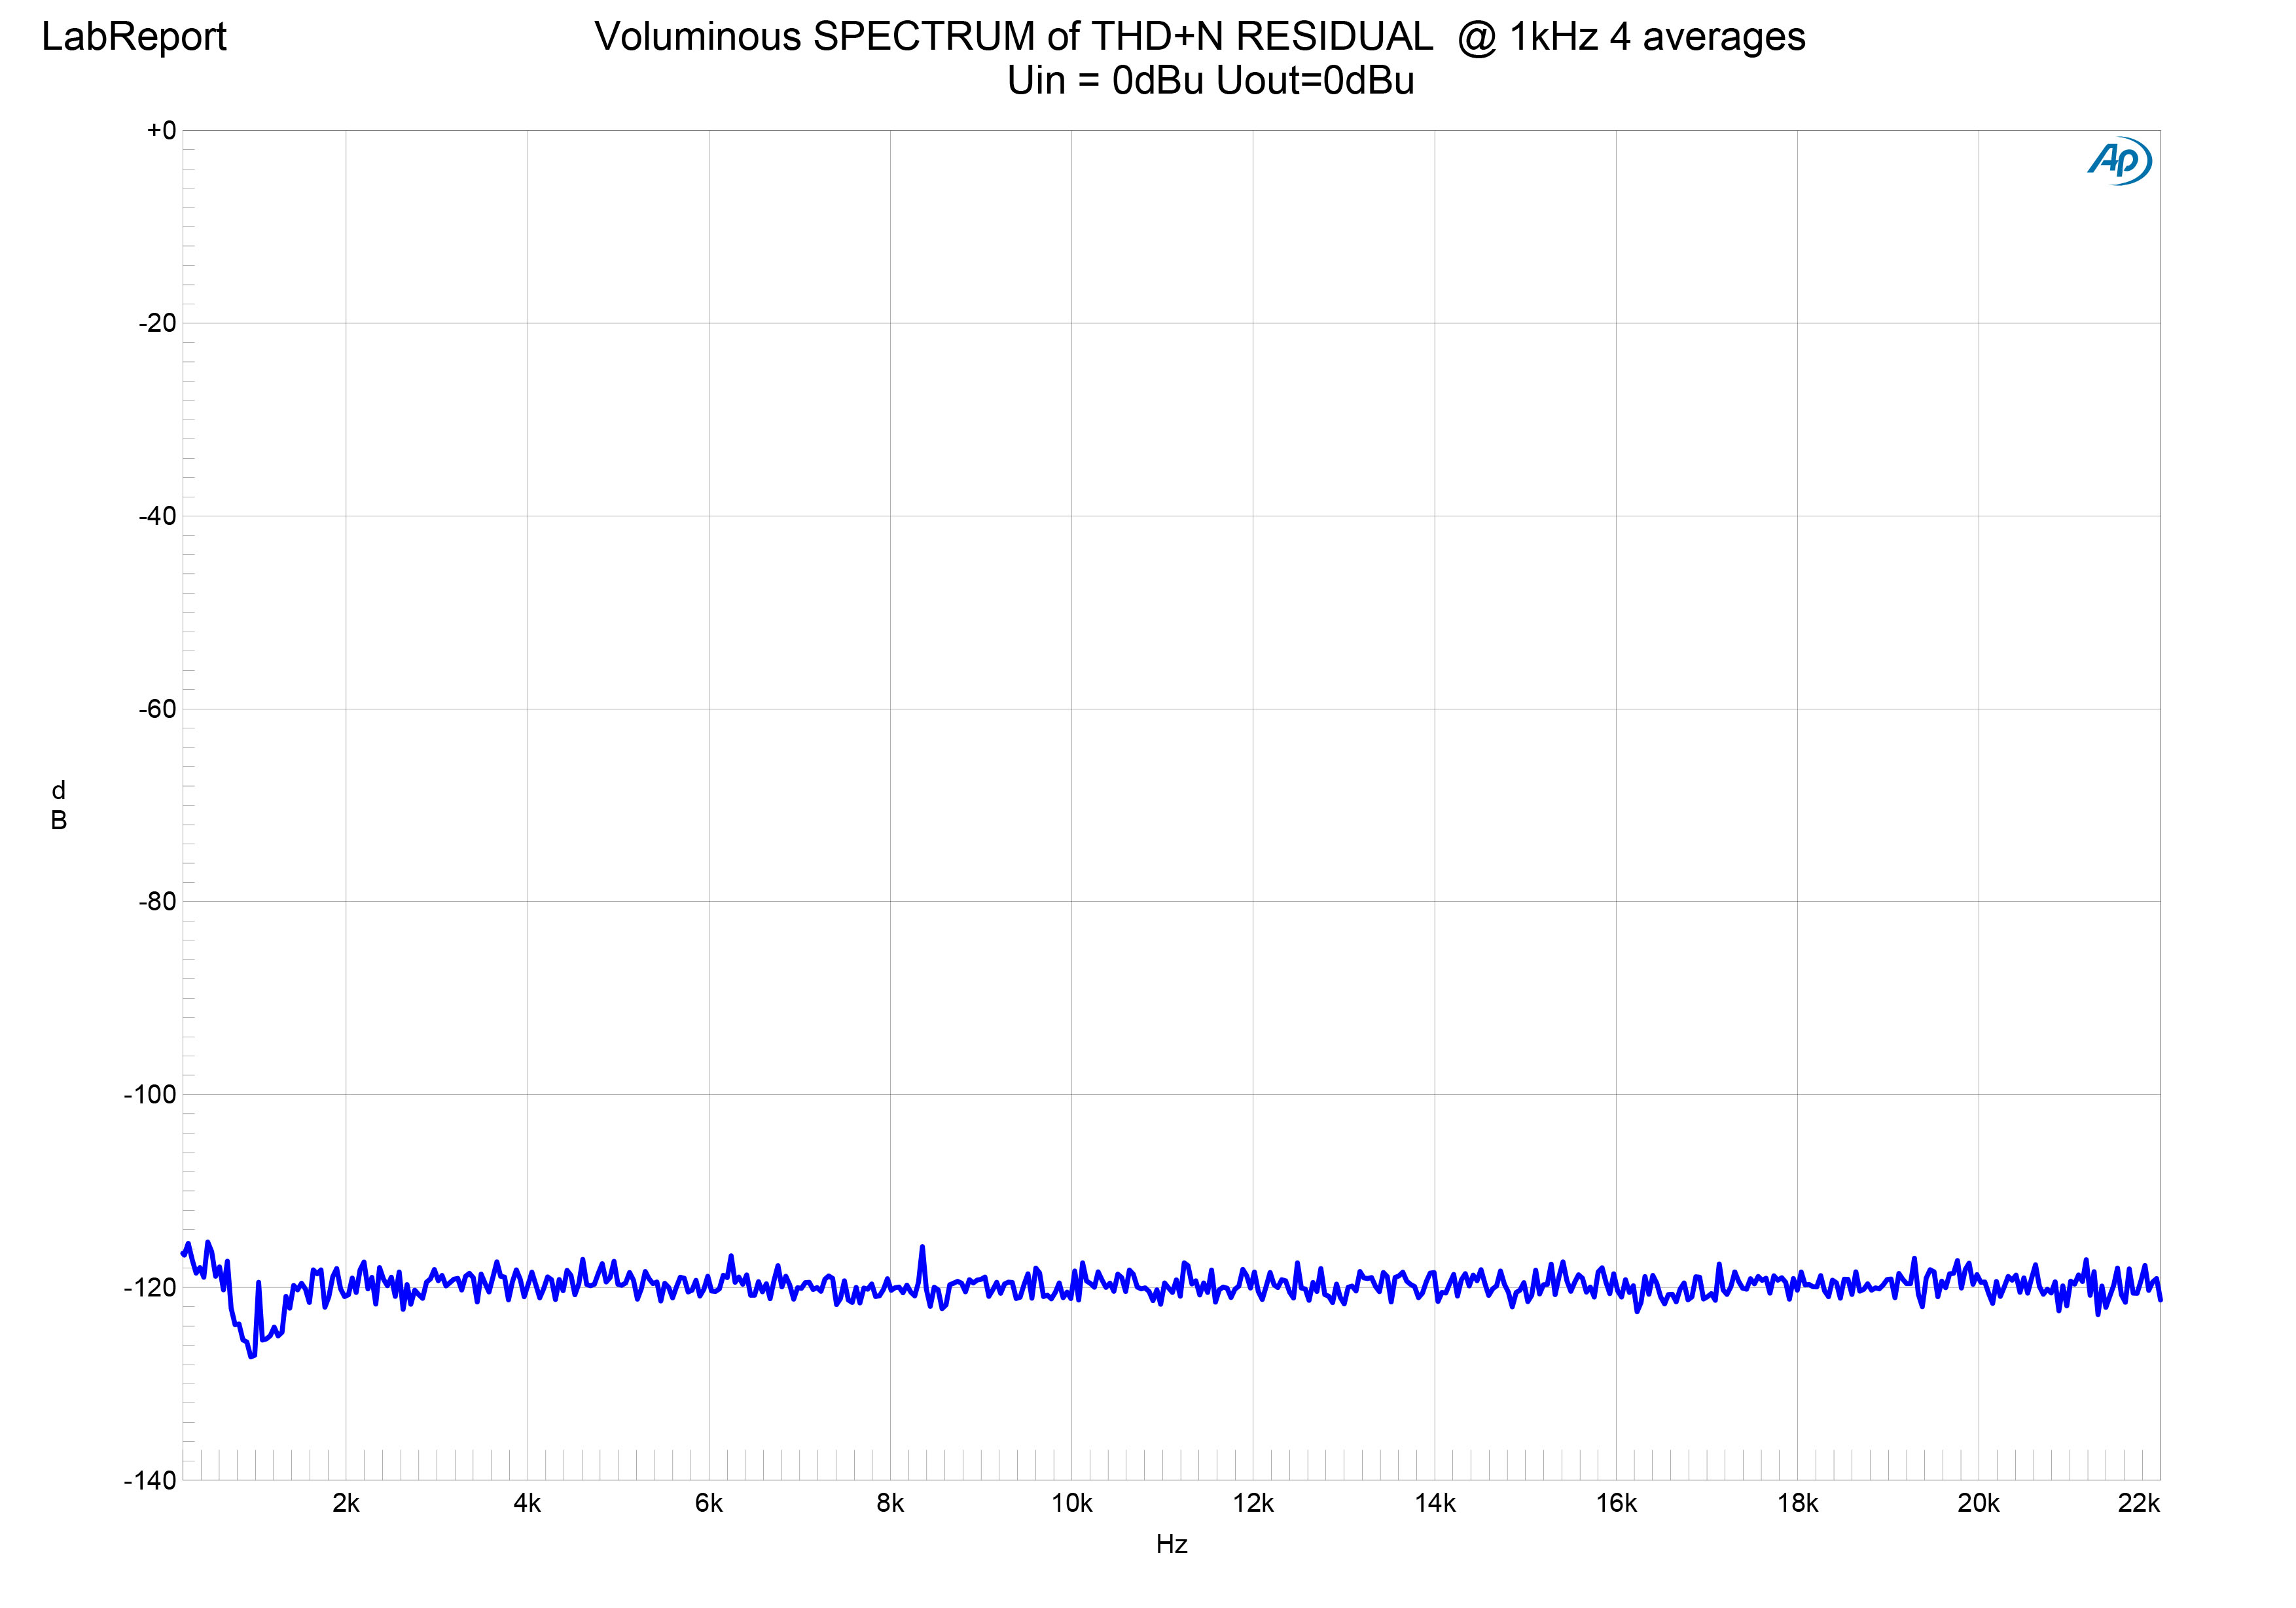 VoluminousSPECTRUM of THD+N RESIDUAL 0 .jpg